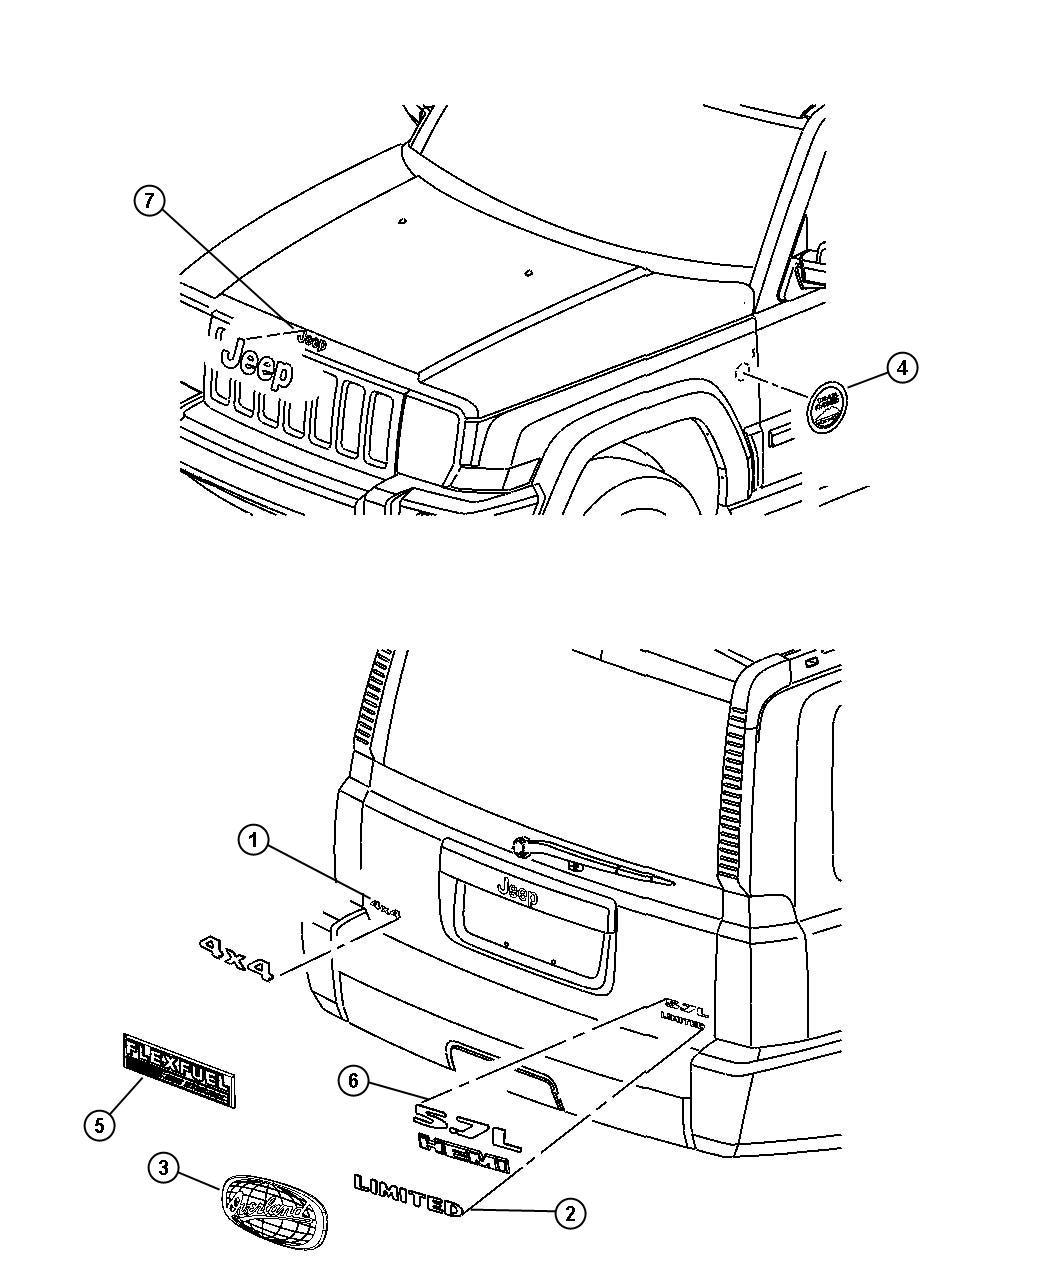 2009 Jeep Commander Exterior: 2009 Jeep Commander Nameplate. Hemi. [mw5]. Nameplates